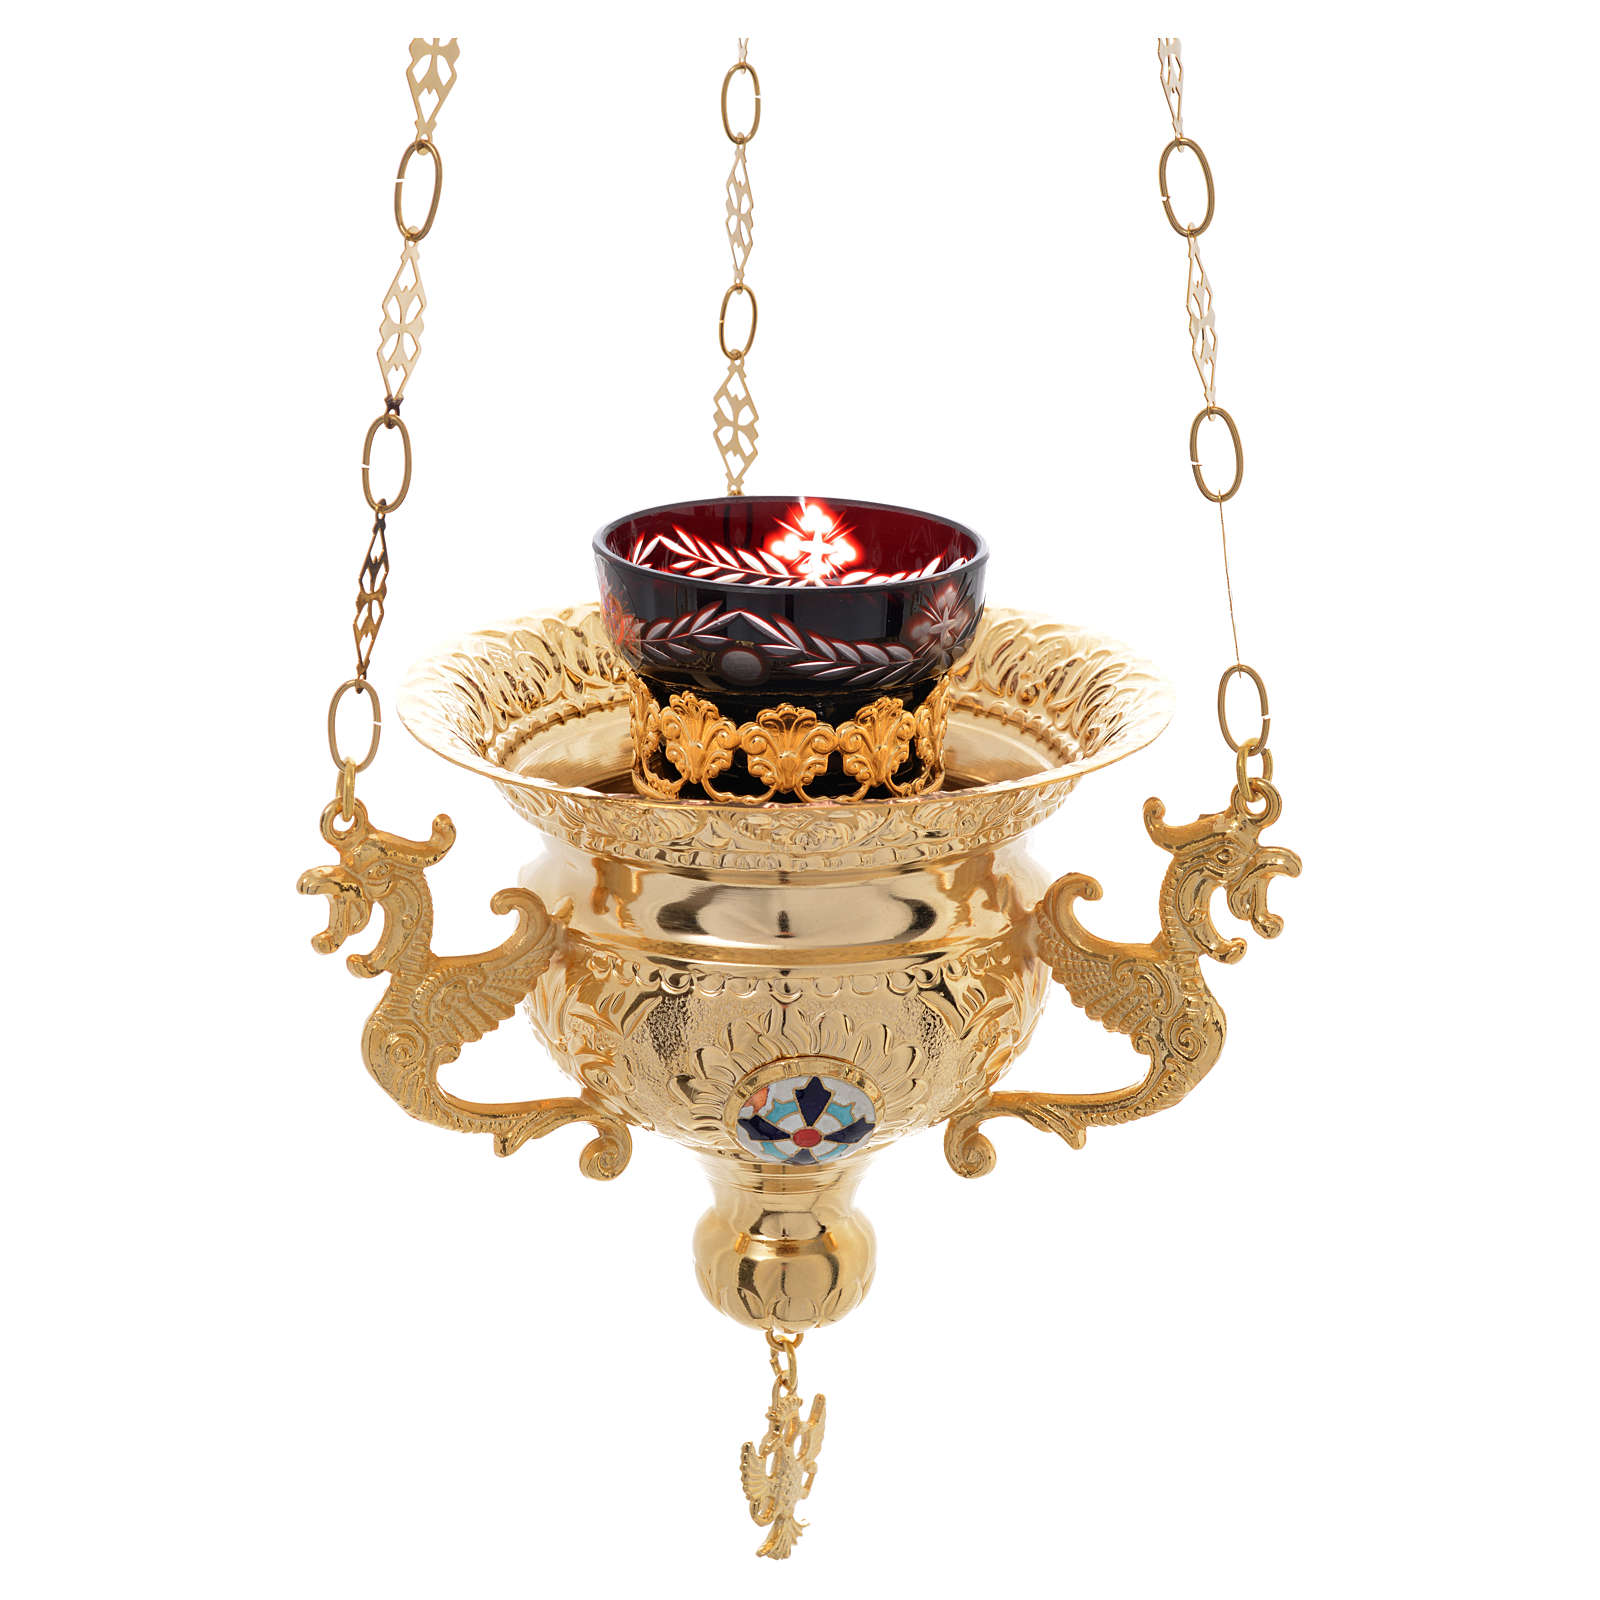 Lámpara para el Santísimo Sacramento Latón 15x15 cm Estilo Ortodoxo 3